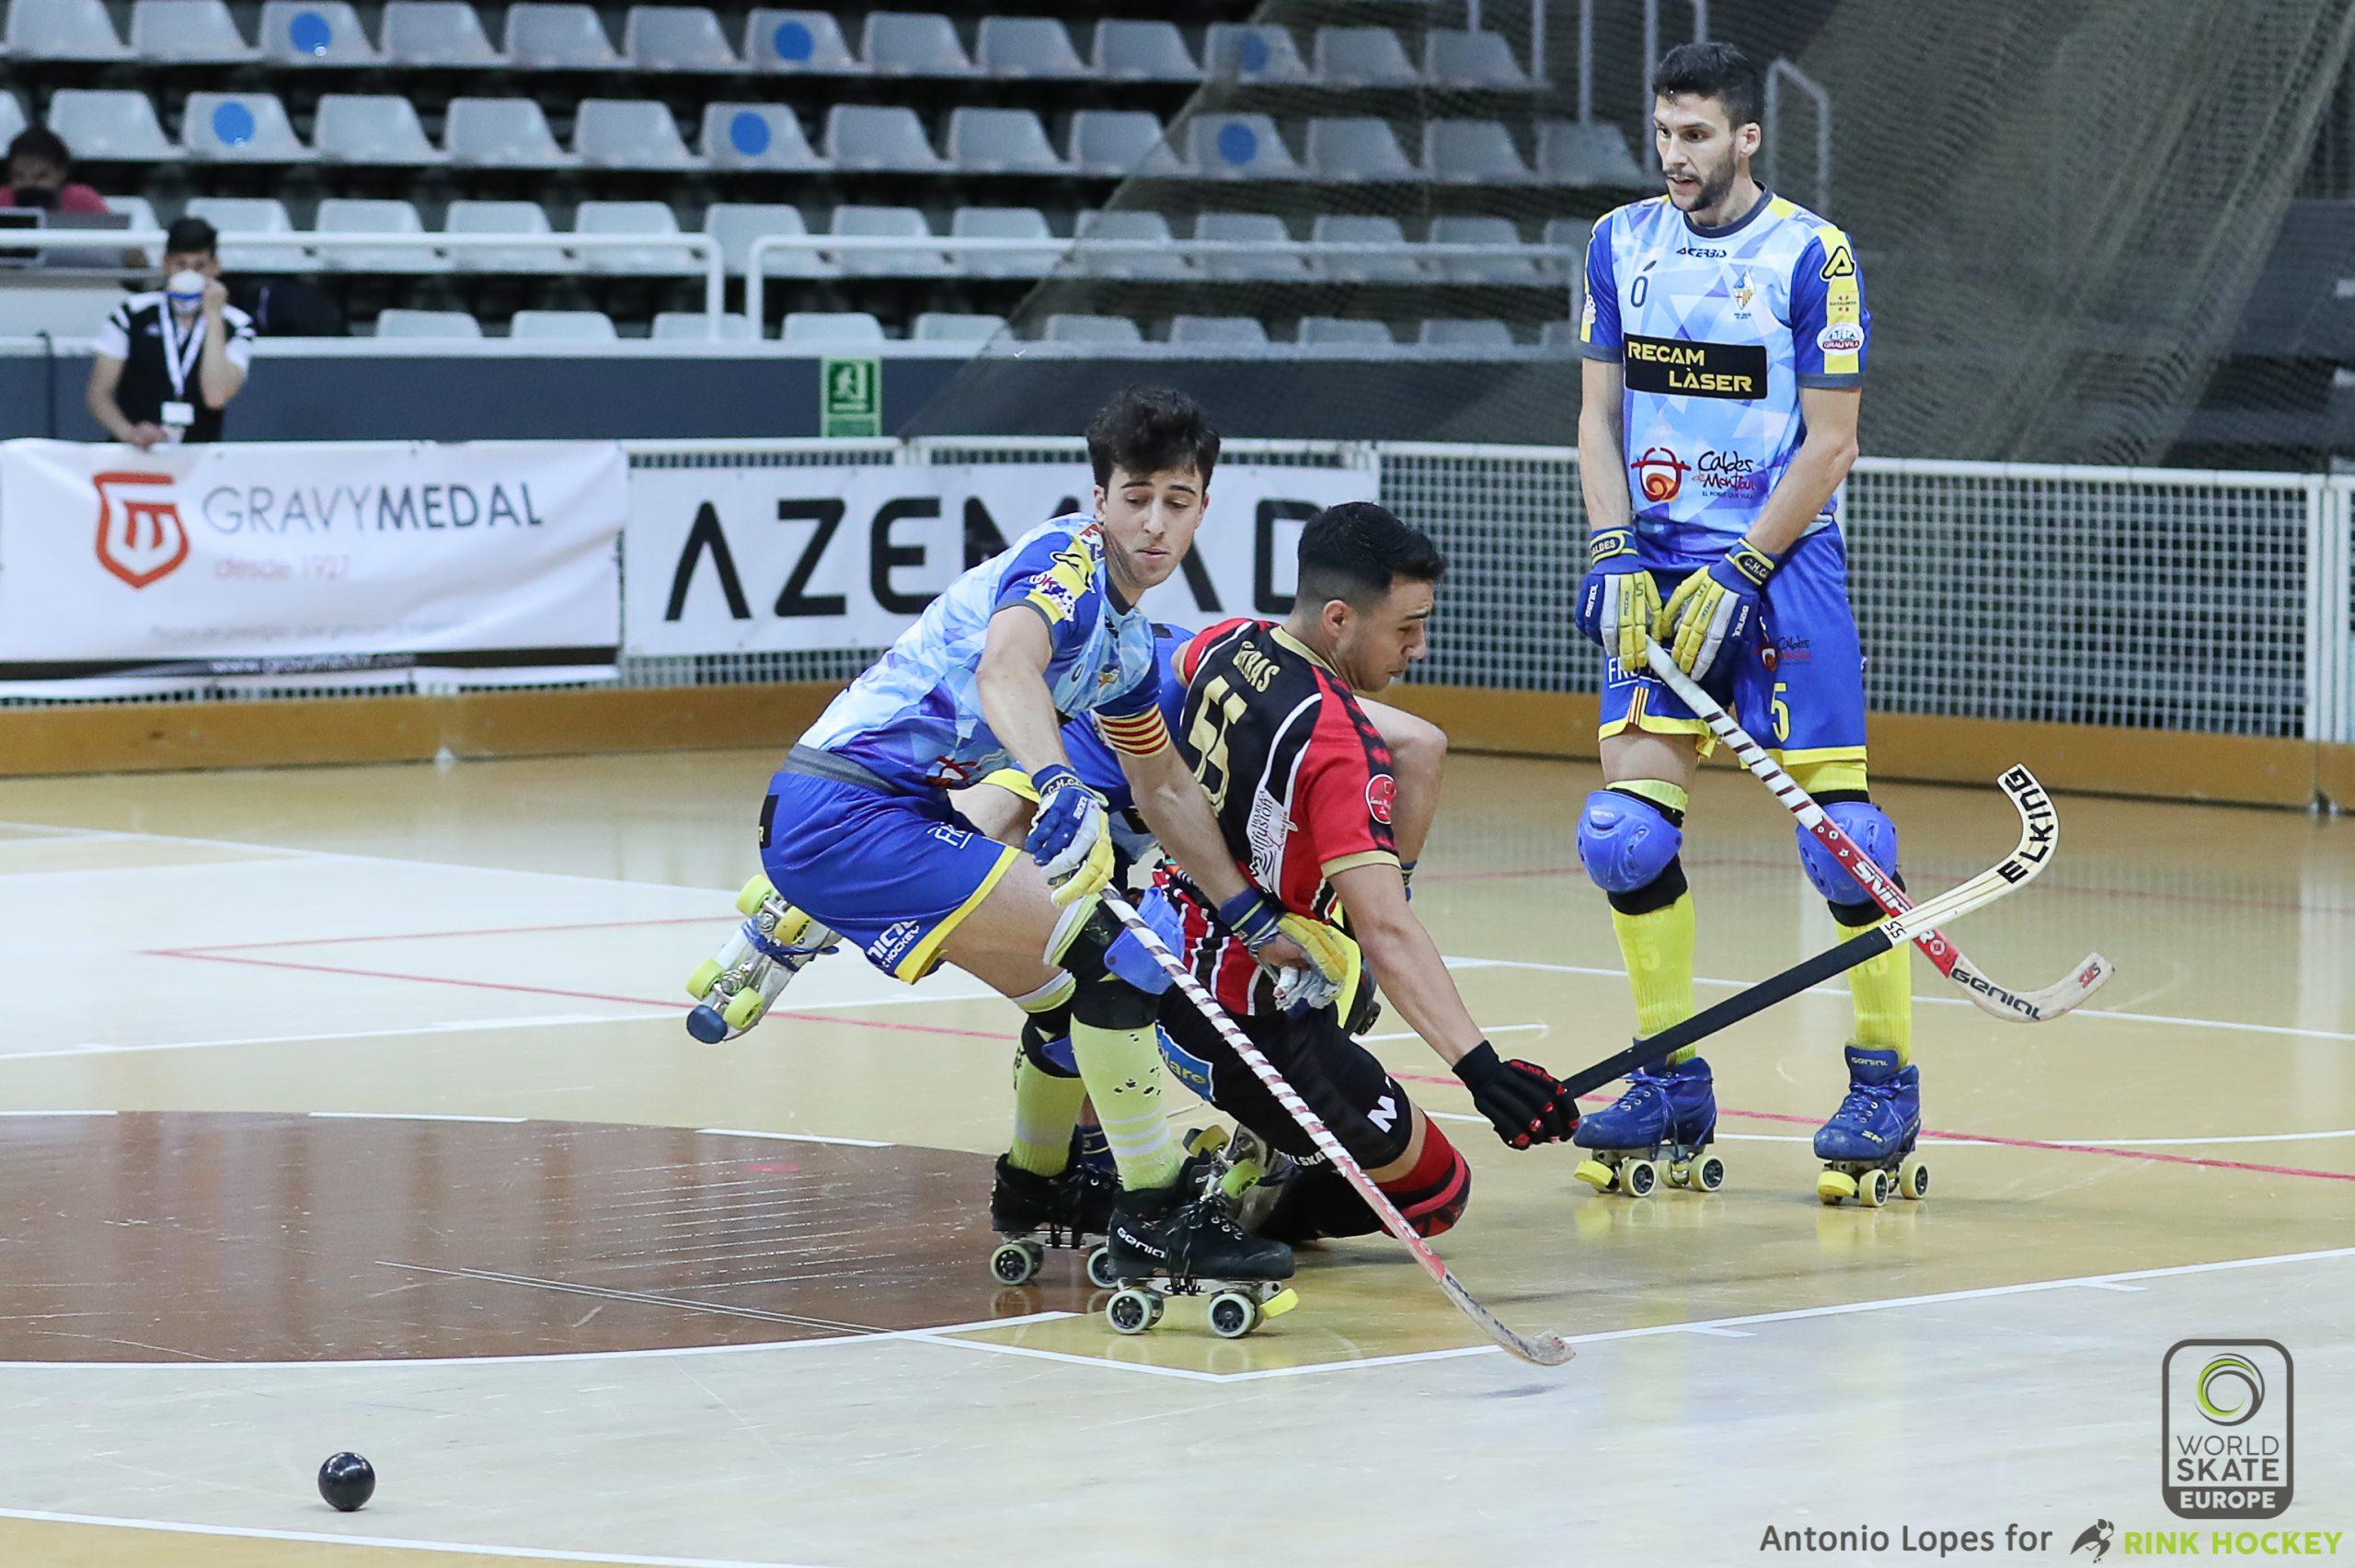 PHOTOS - 19-06-2021 - WS EUROPE CUP - Match #024 - SF2 - H. Sarzana (IT) x CH Caldes (SP)